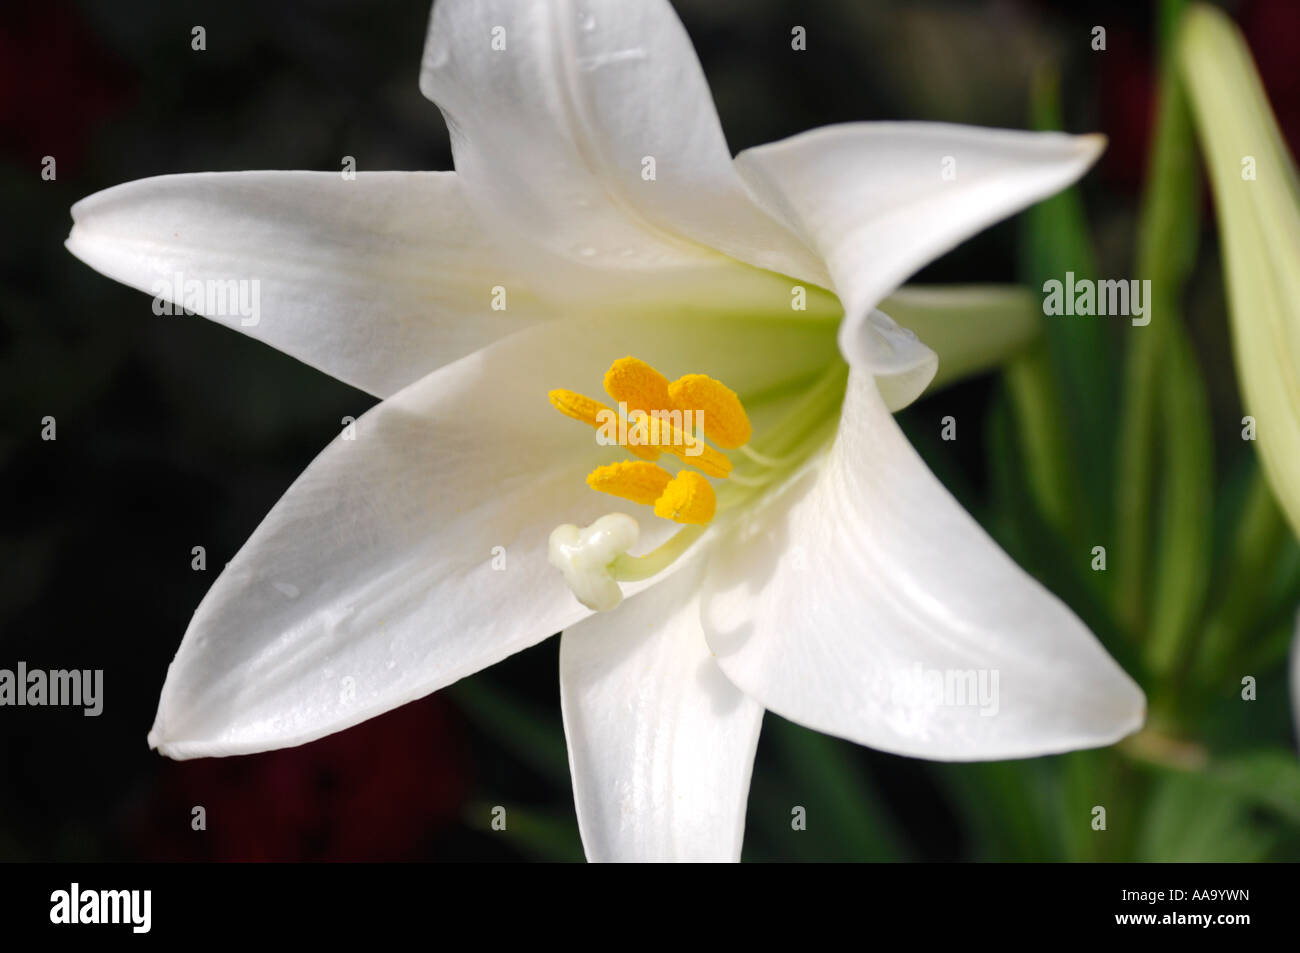 White madonna lily lilium candidum flower stock photo 12562784 alamy white madonna lily lilium candidum flower izmirmasajfo